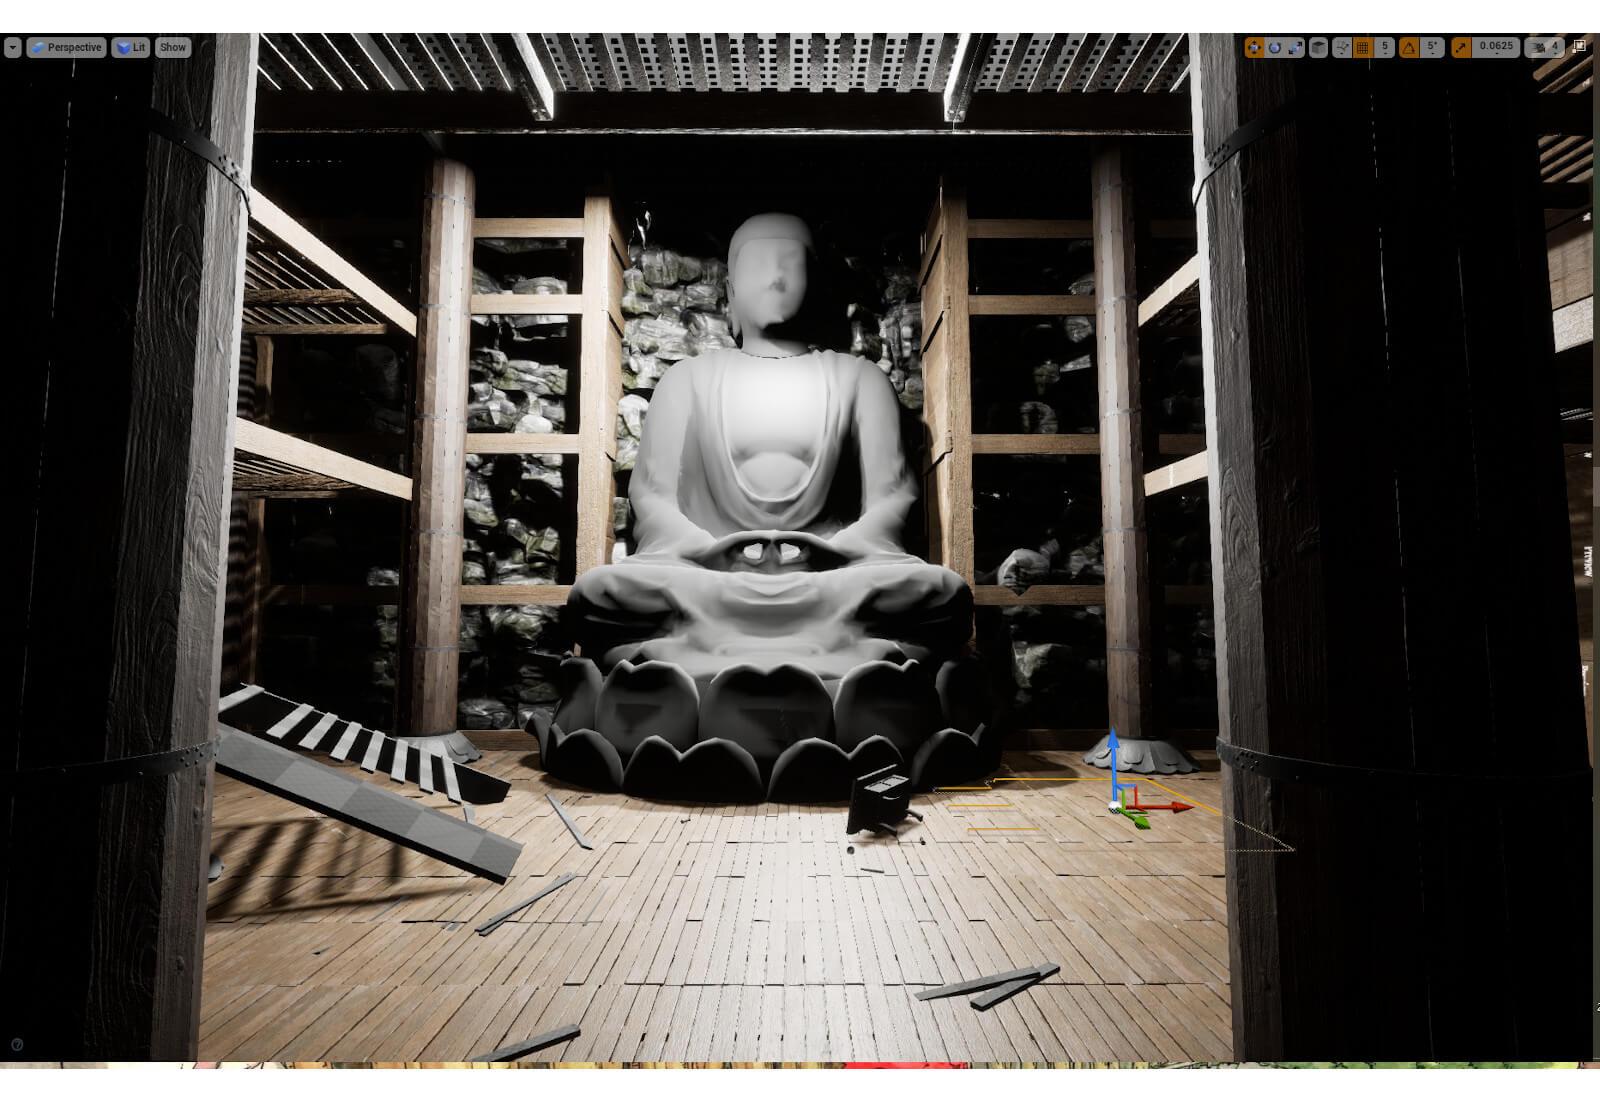 3D temple environment model in progress